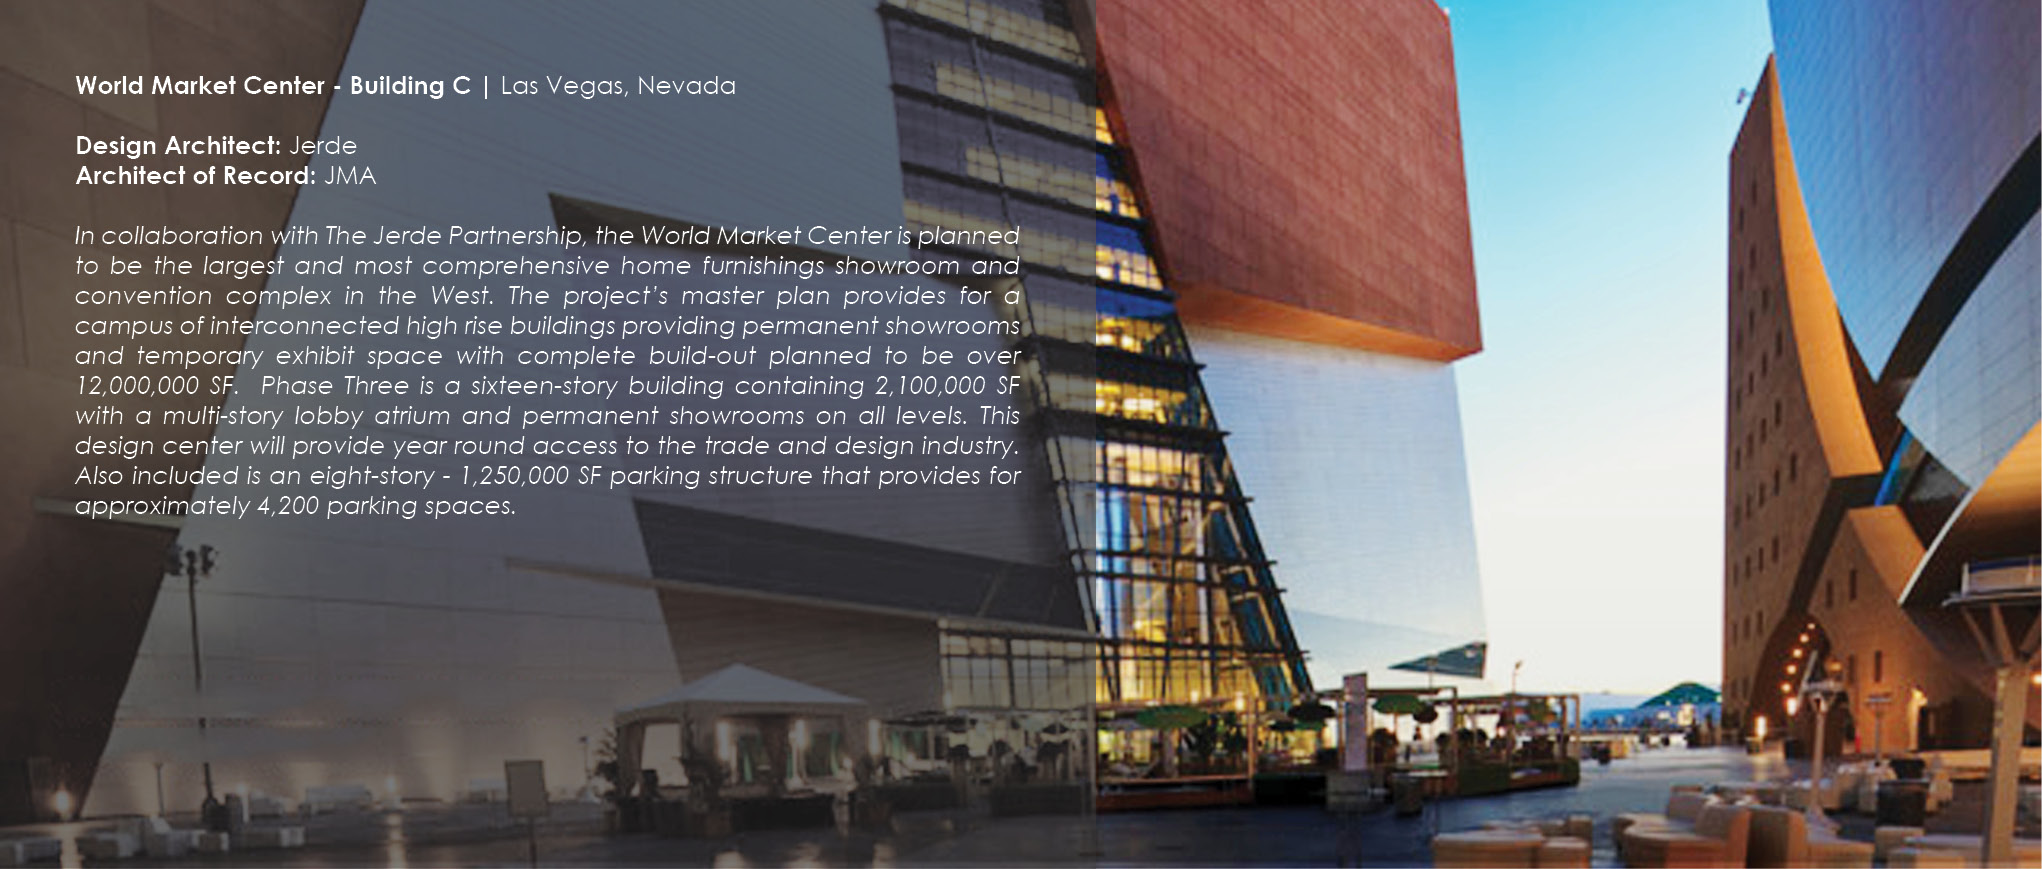 WMC Building C